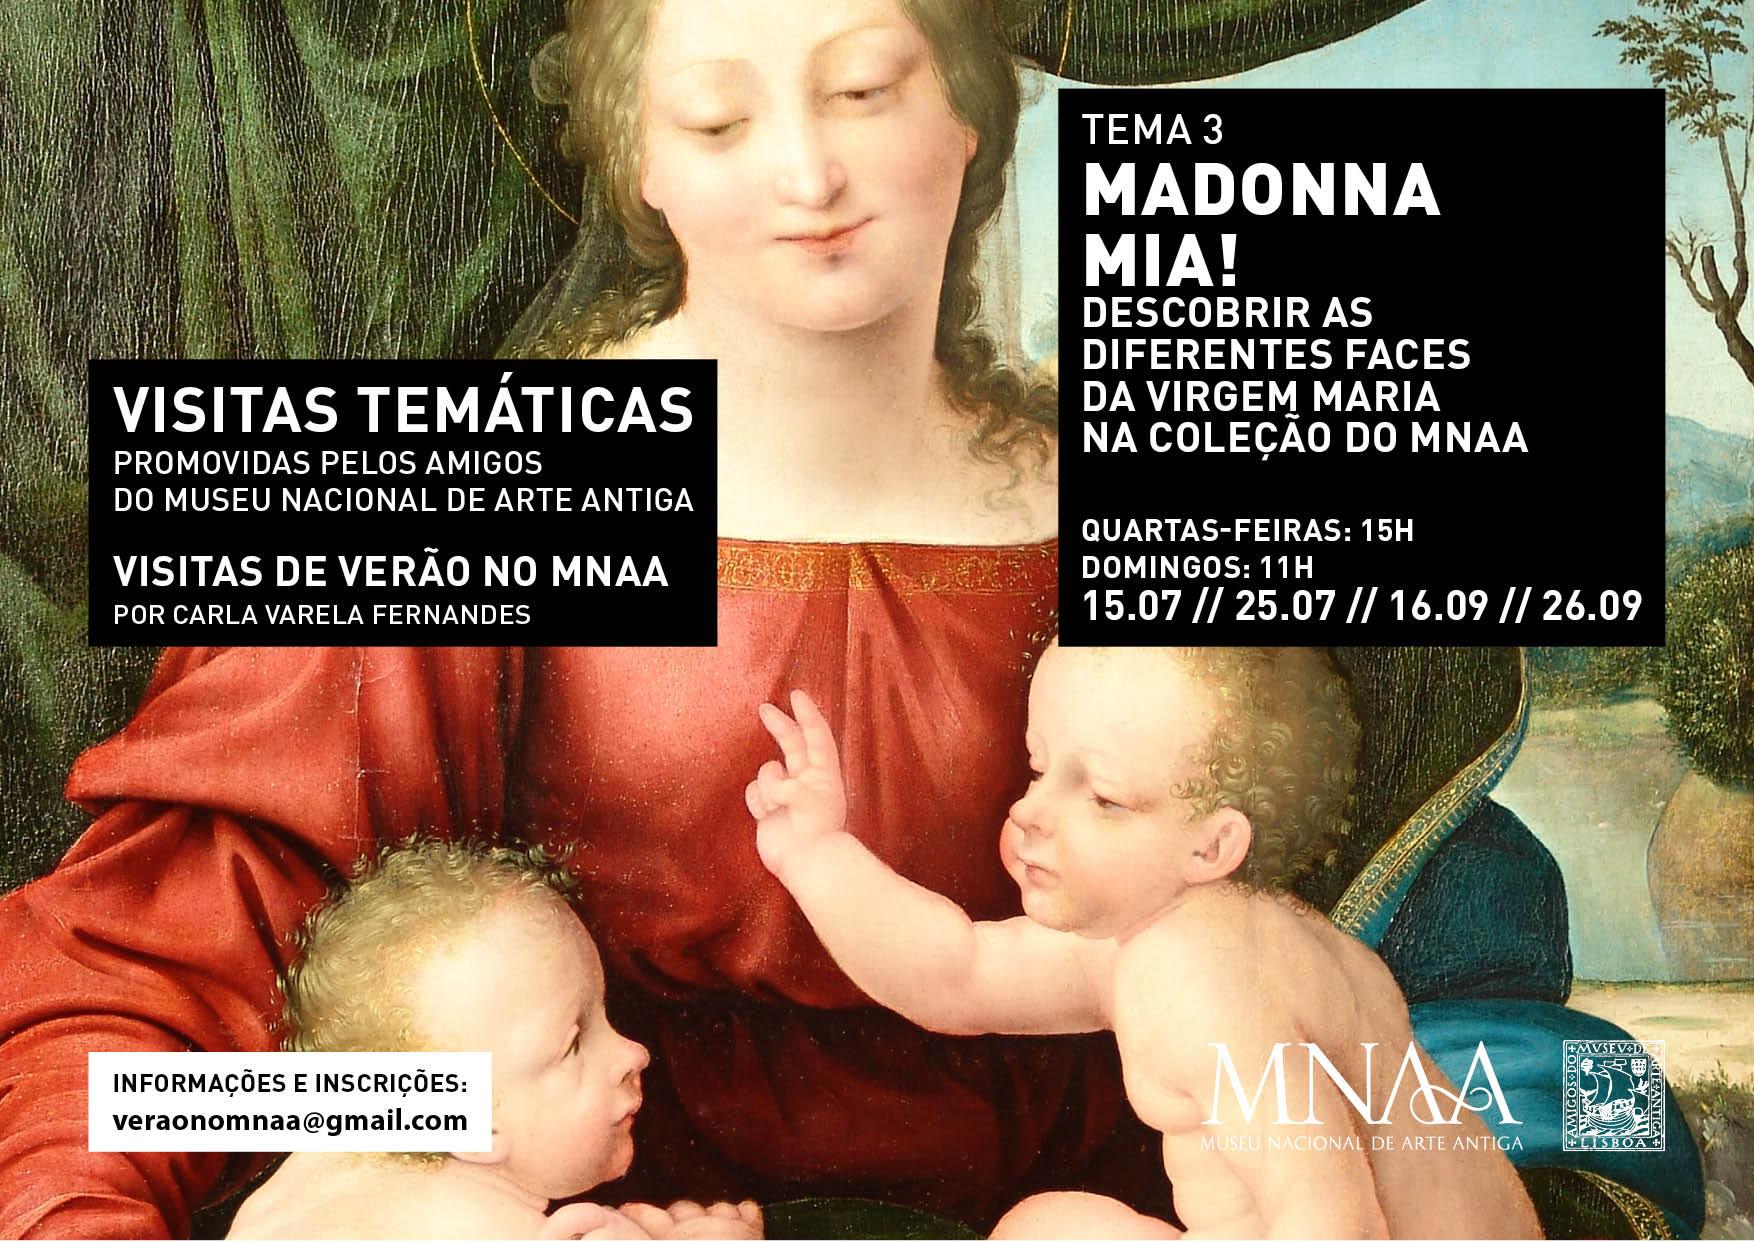 TEMA3 - visitas temáticas grupo amigos Museu Nacional de Arte Antiga